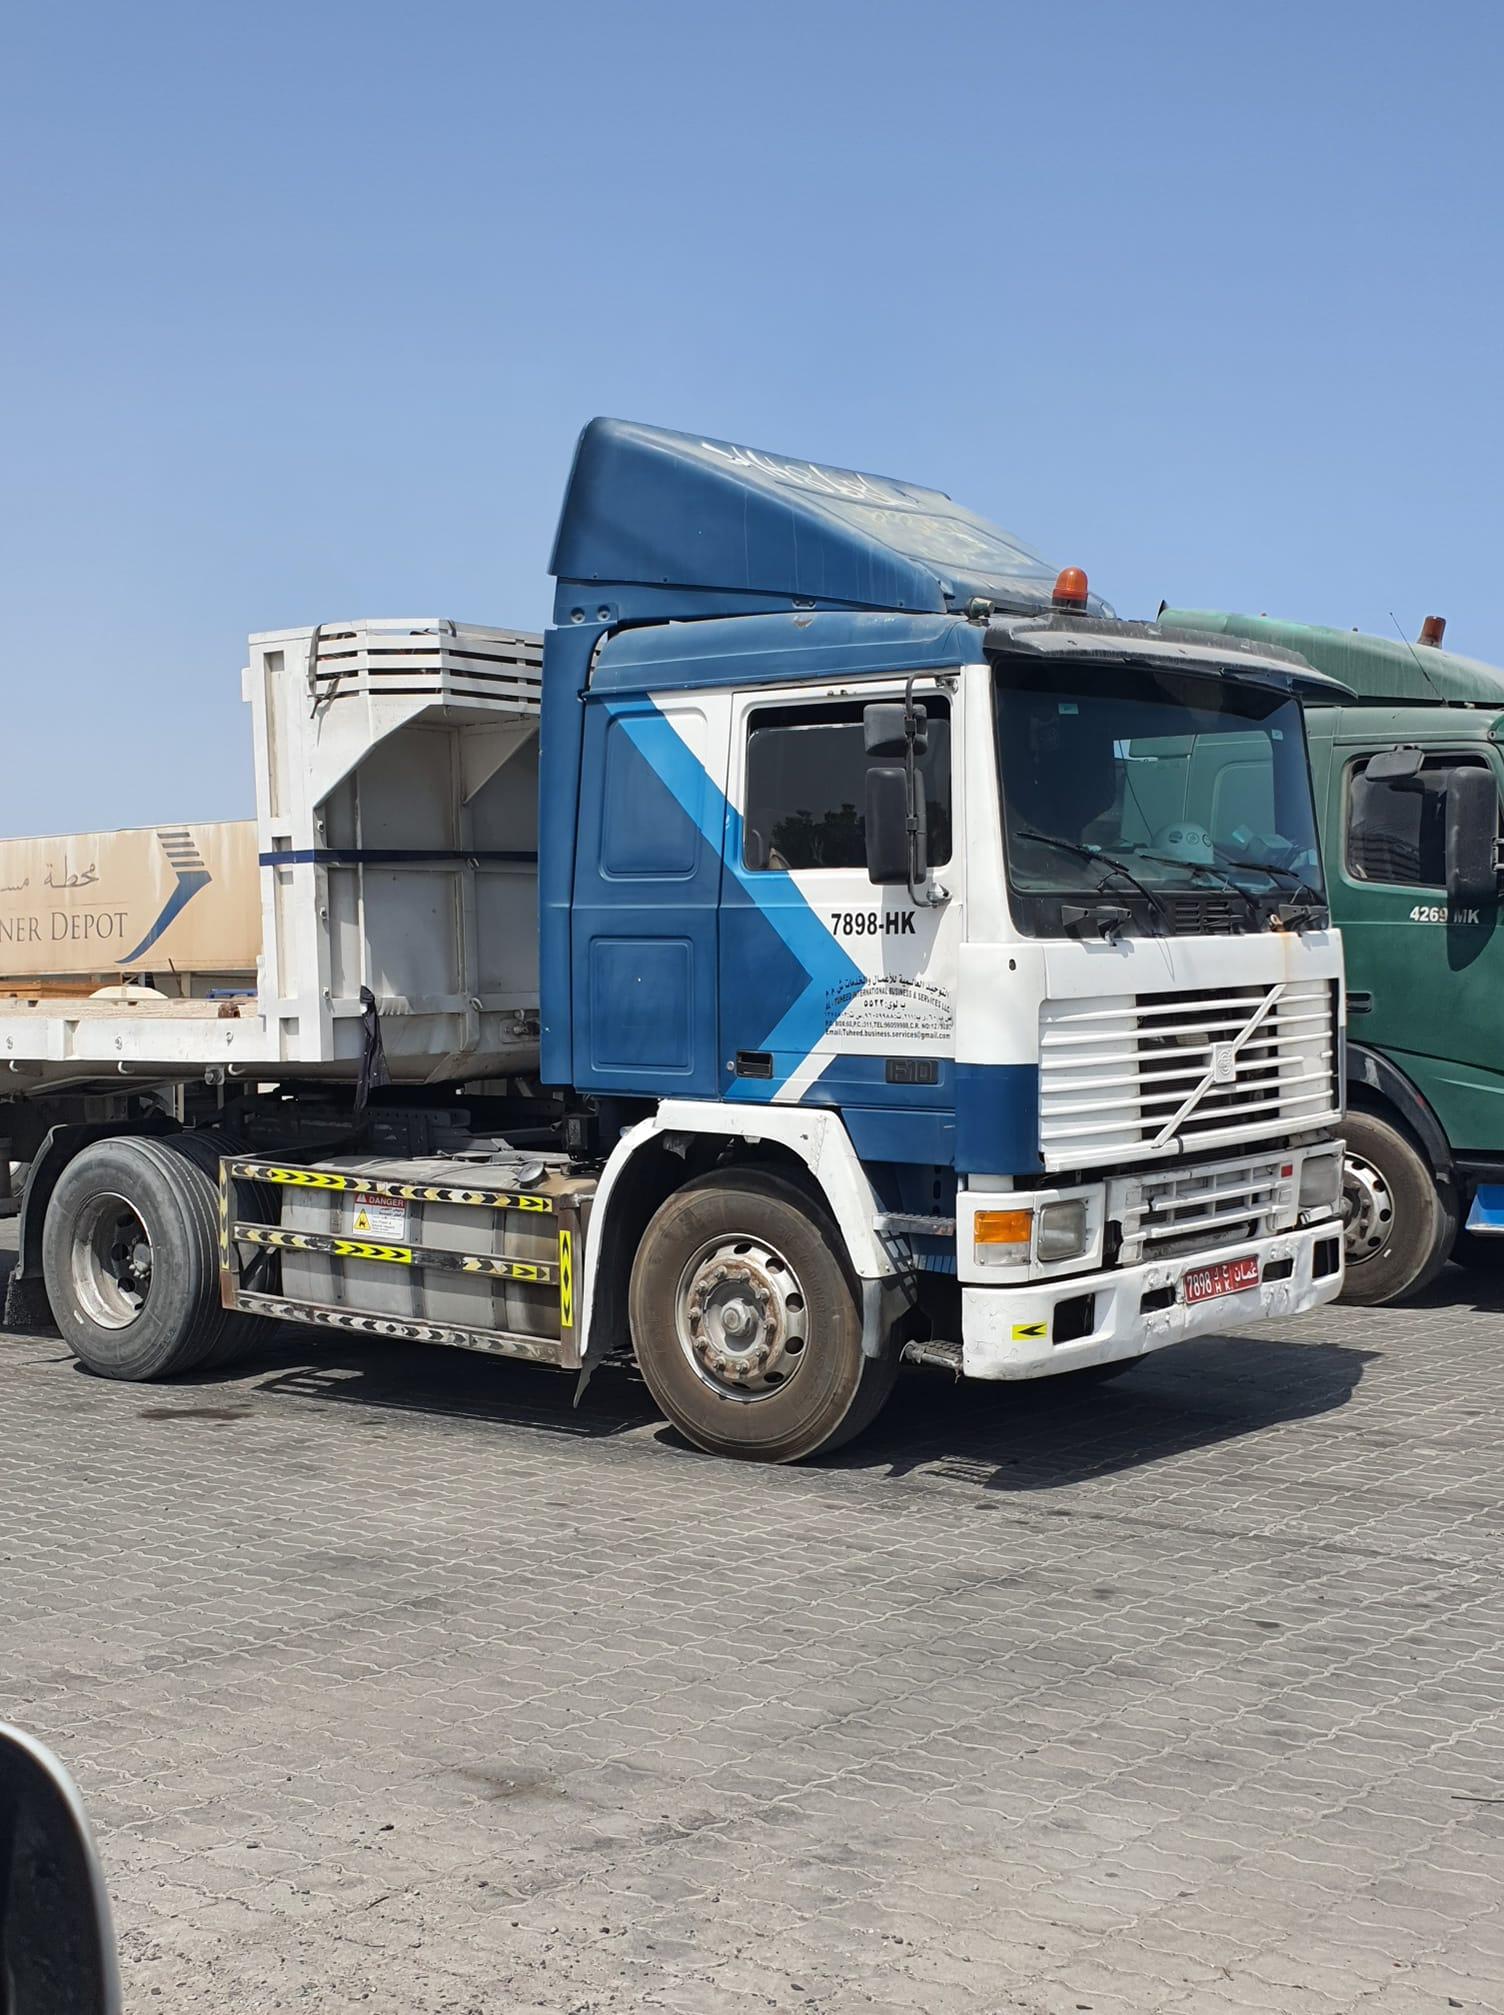 Muscat-Oman-29-9-2021-Edwin-Bijmholt-foto